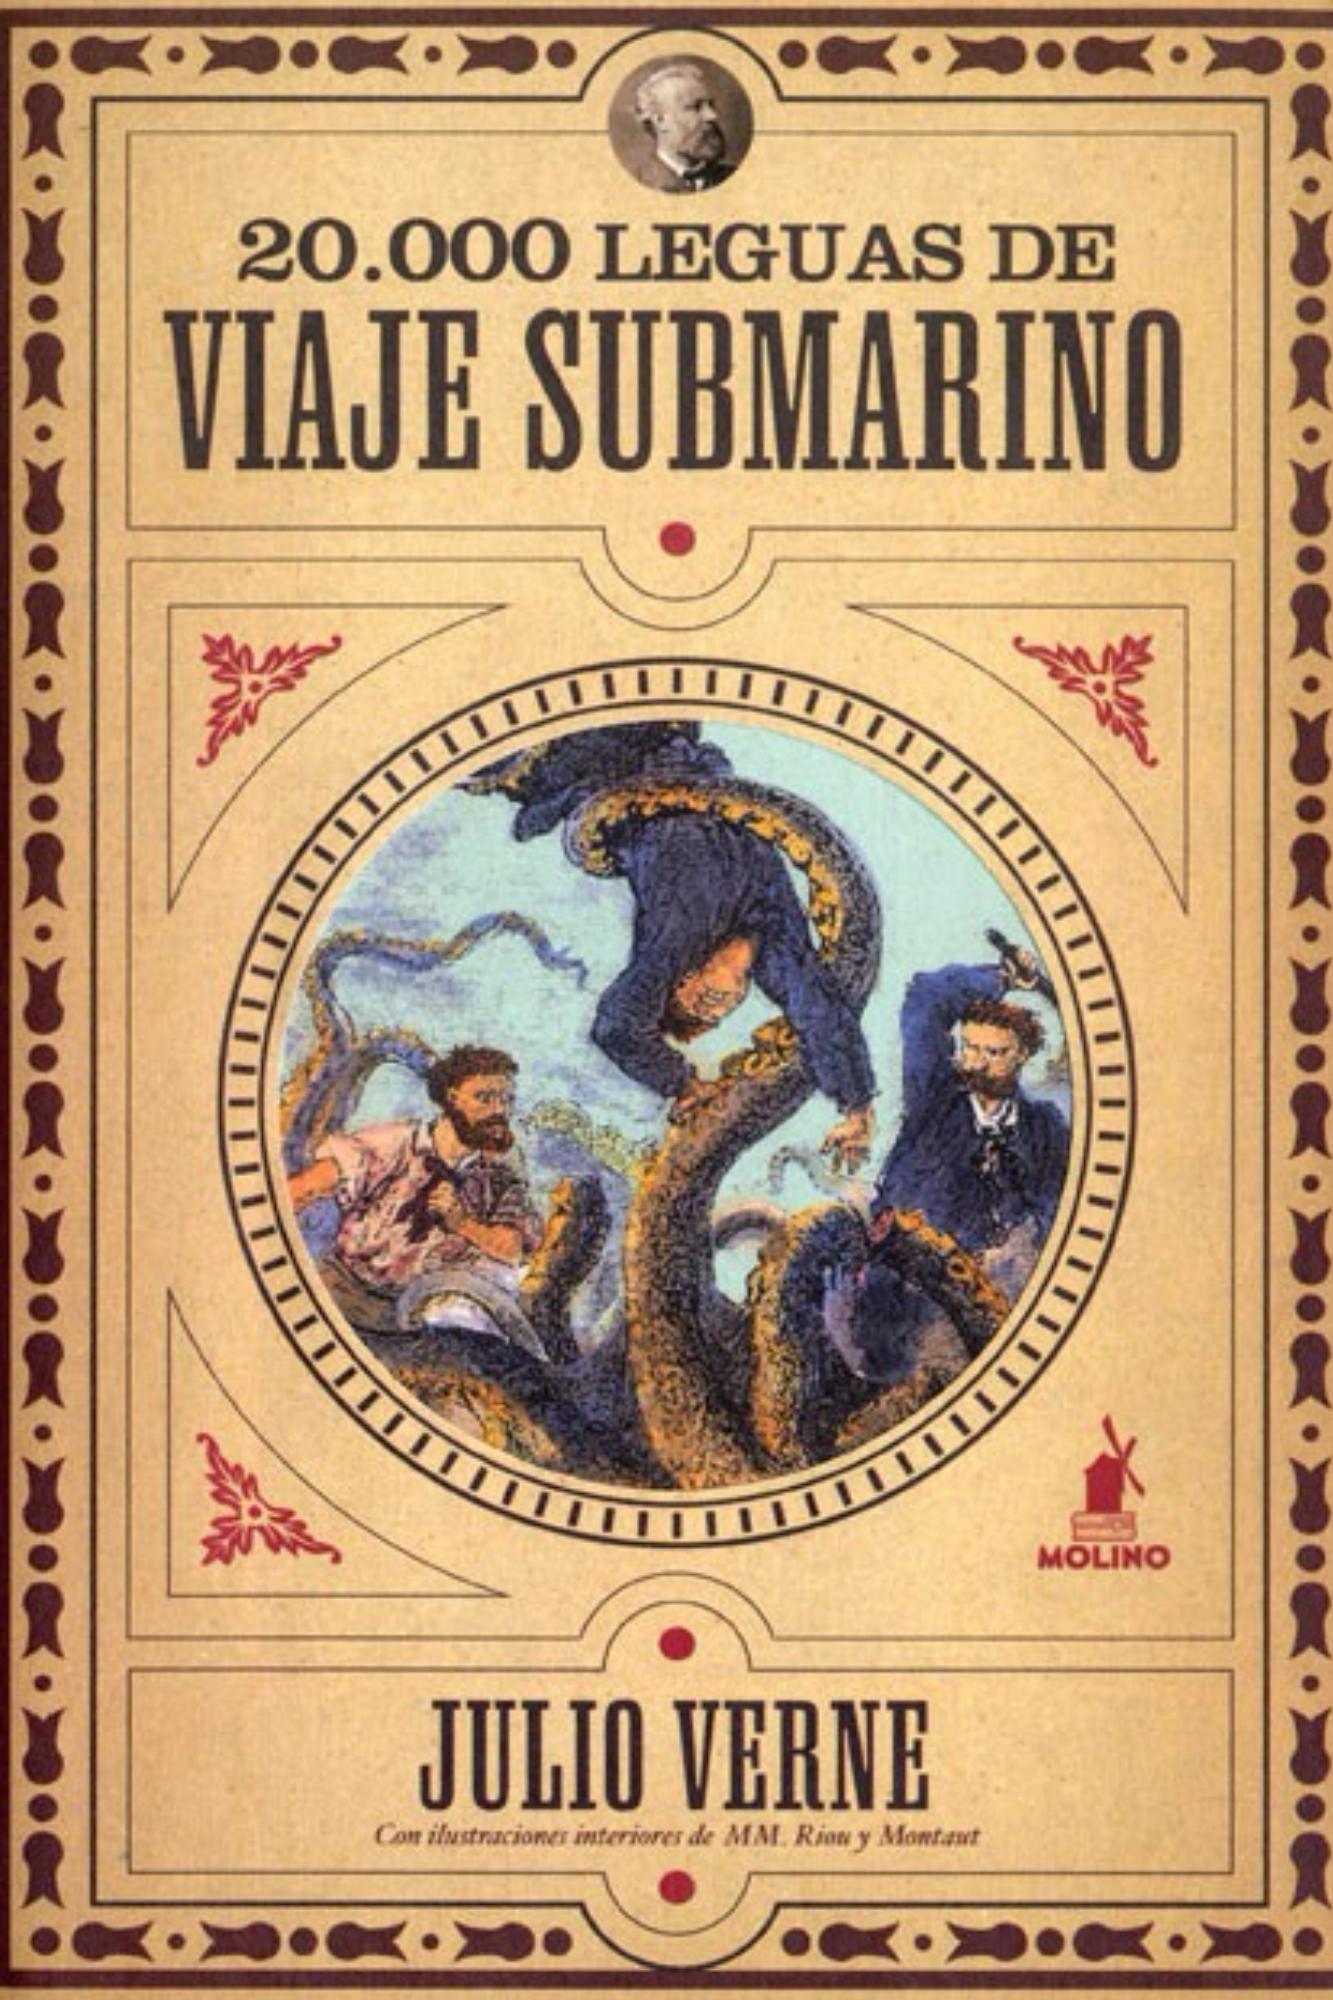 20000 leguas de viajes submarinos